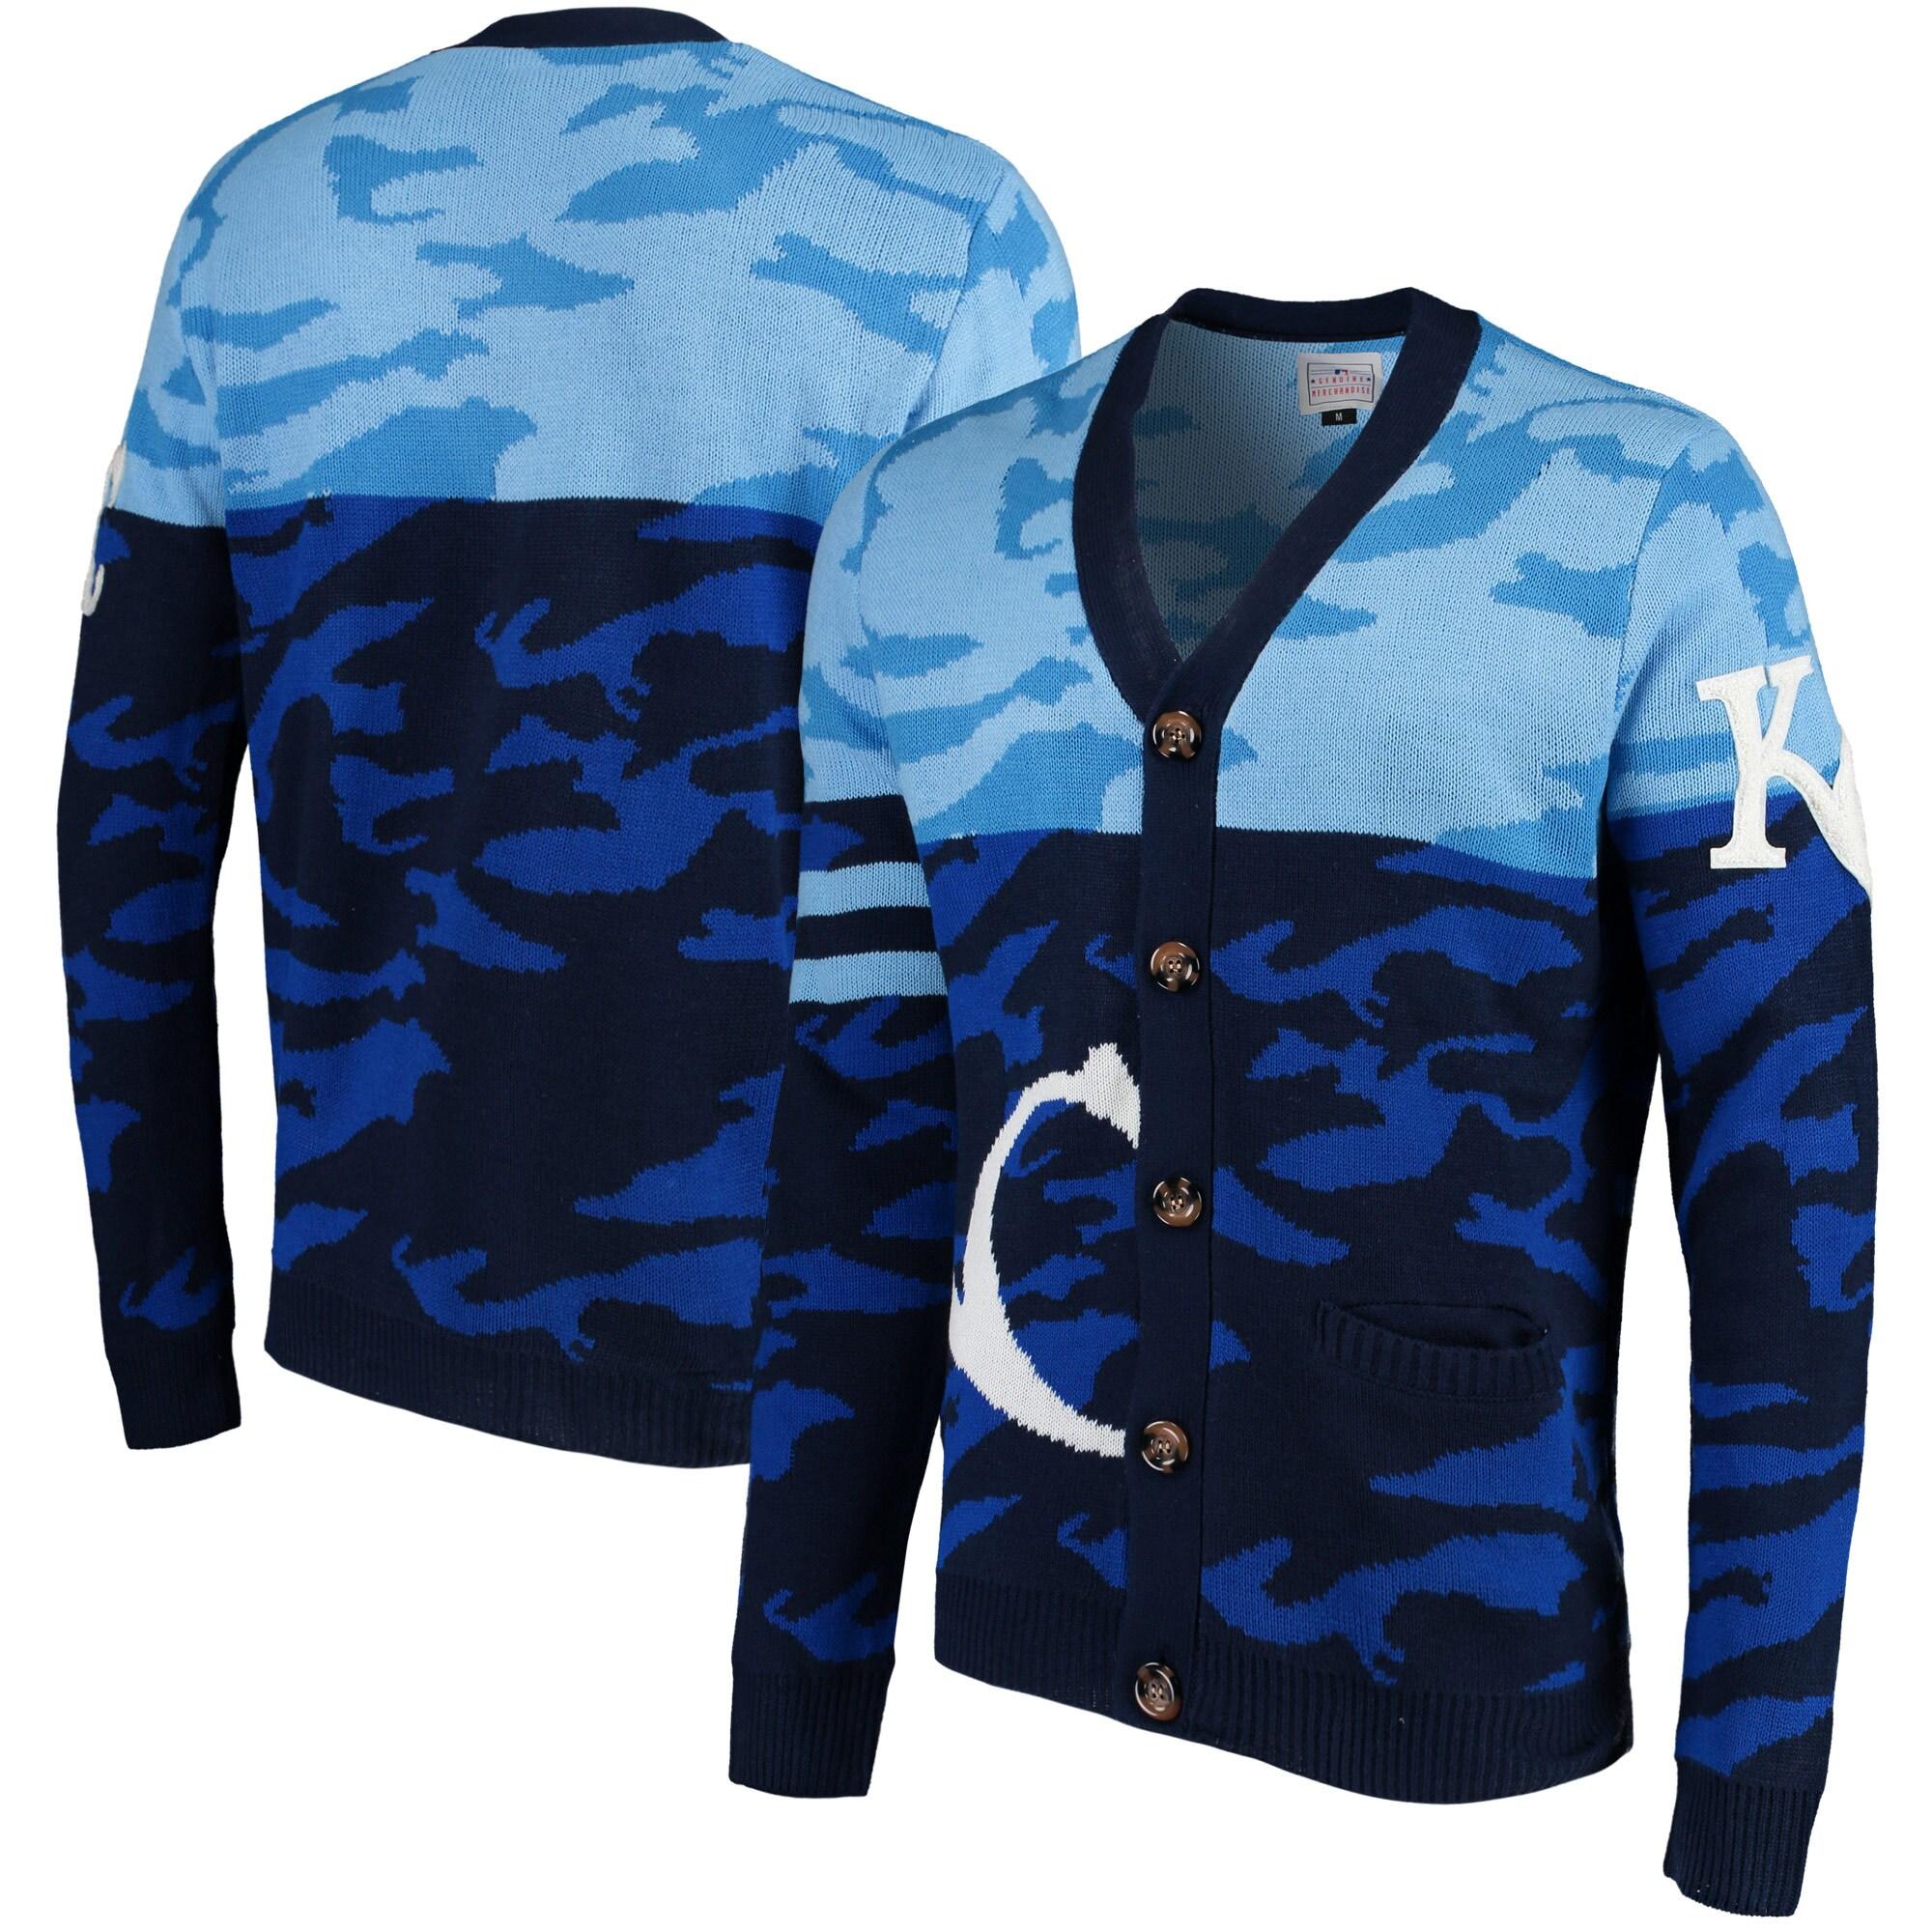 Kansas City Royals Camouflage Cardigan Sweater - Royal